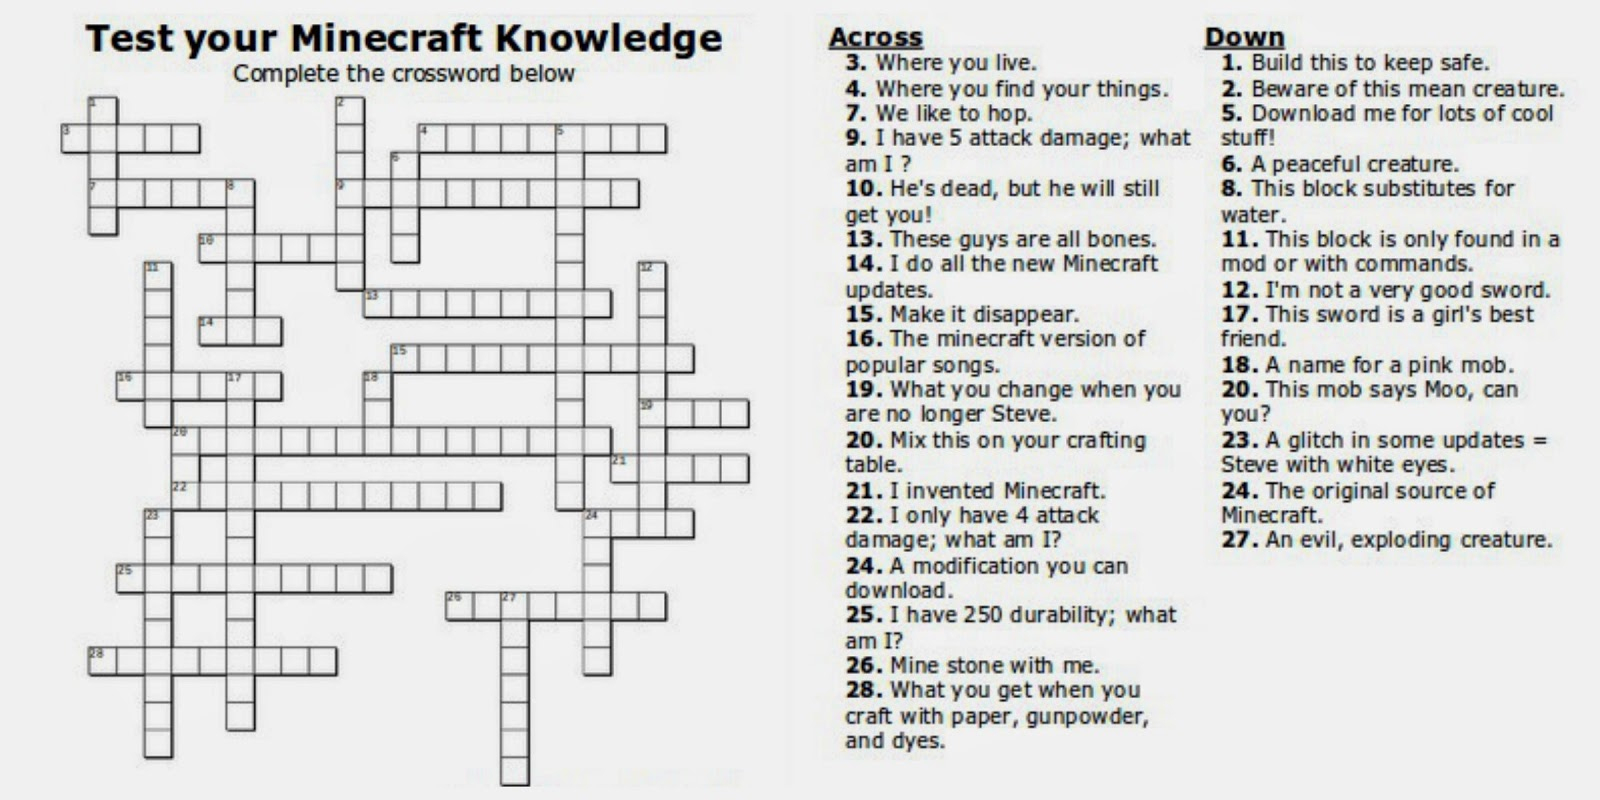 Free Printable Minecraft Crossword Search: Test Your Minecraft - Printable Youth Crossword Puzzles